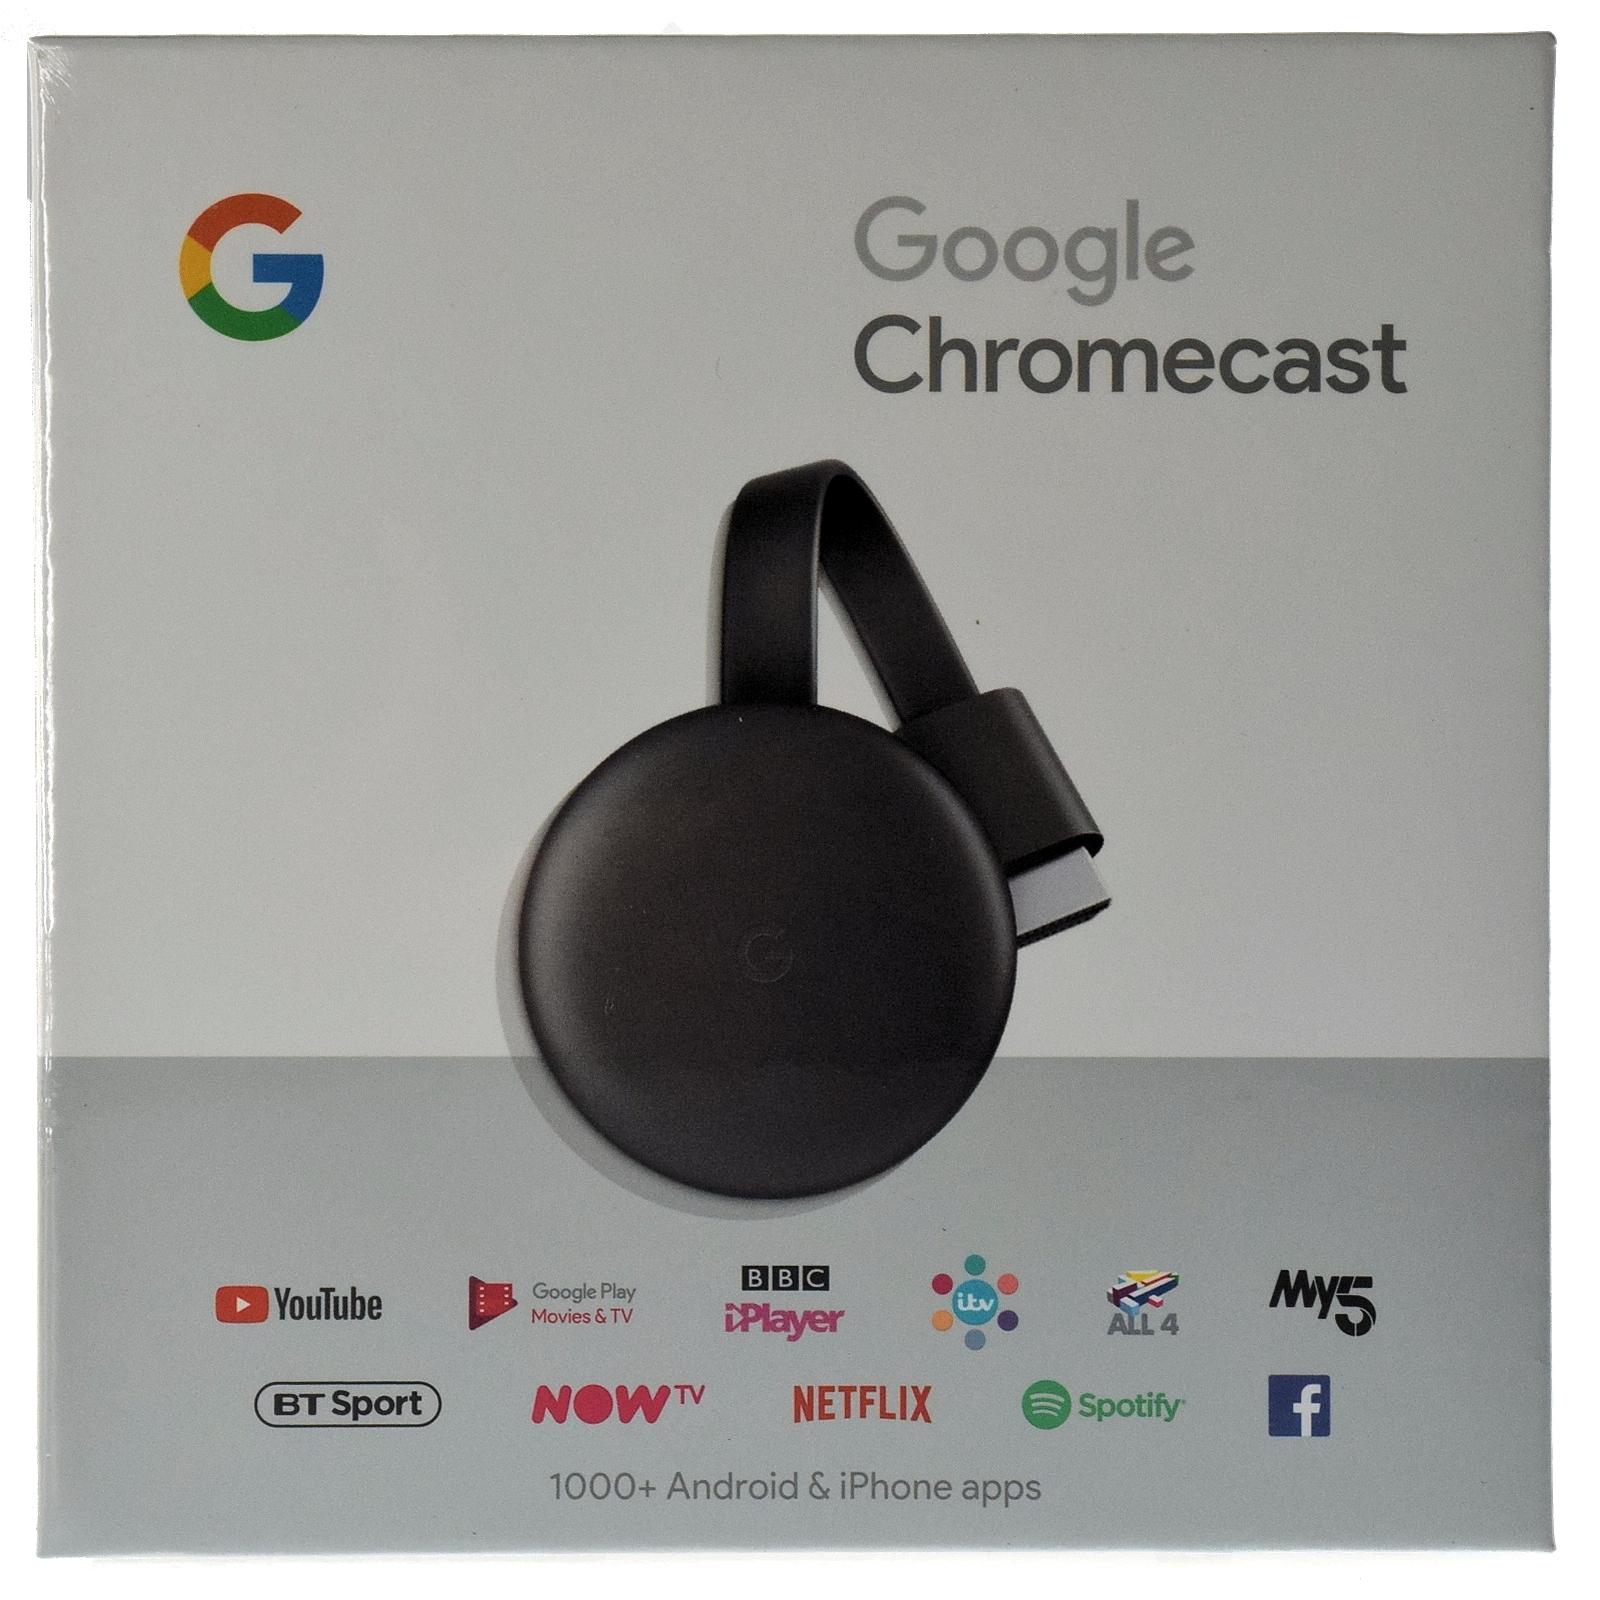 Google Chromecast 3rd Generation 1080p Resolution | IOOMOBILE